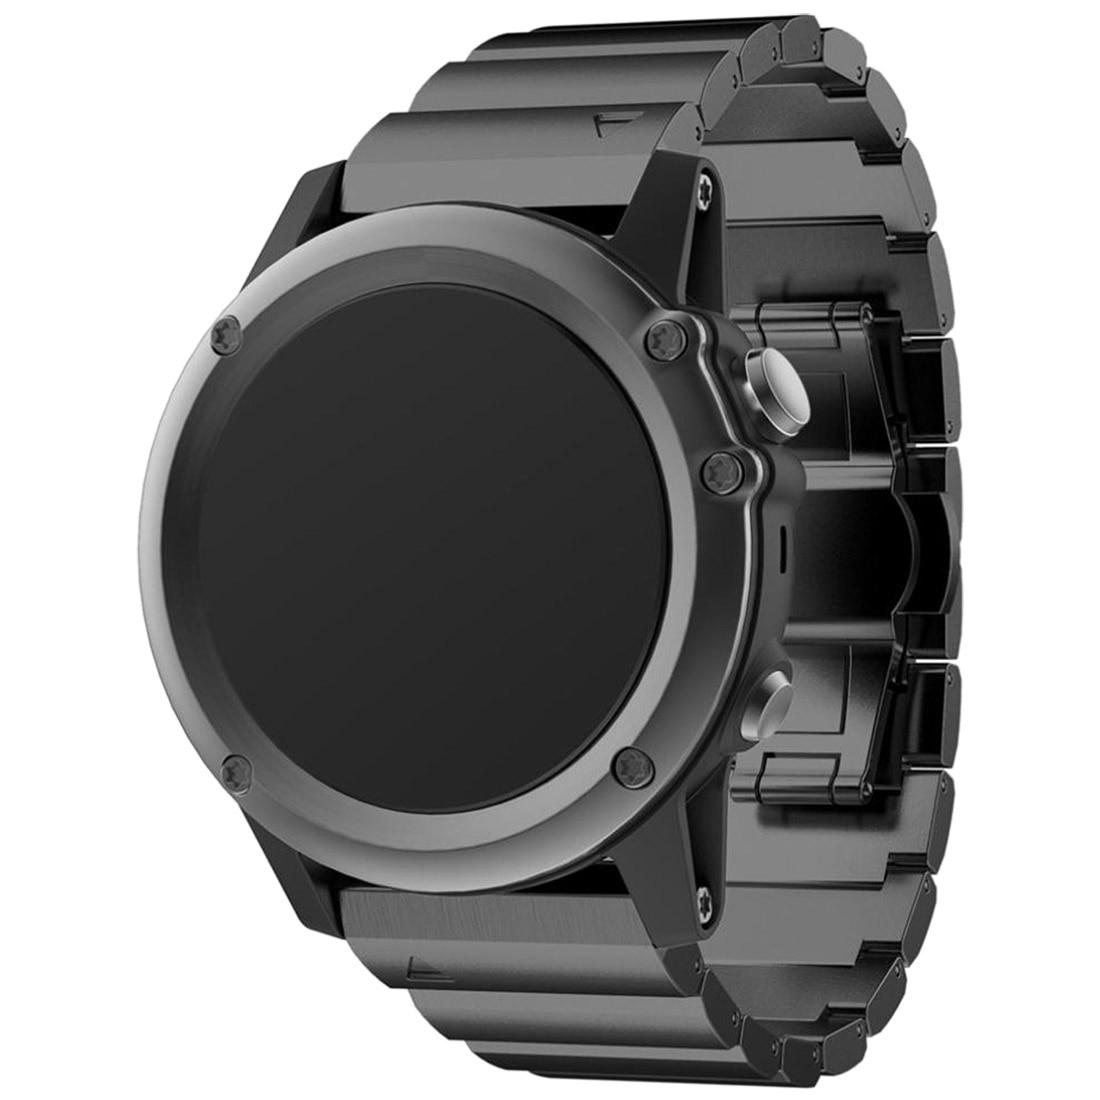 Metal Bracelet Stainless Steel Watch Wrist Band Strap For Garmin Fenix 3 HR Colour Black